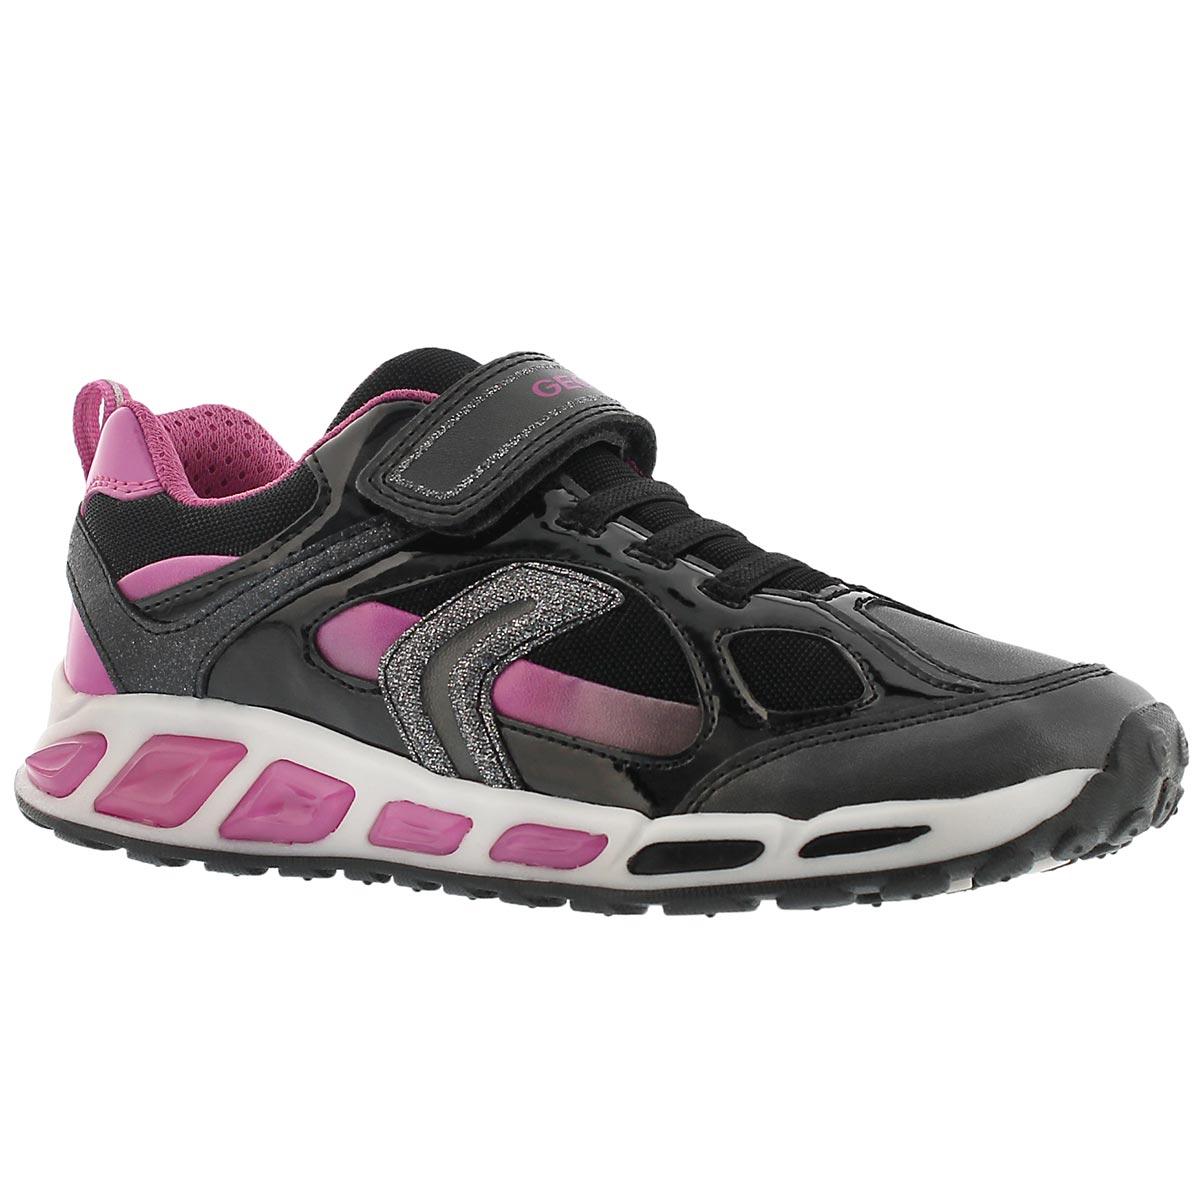 Grls Shuttle black/fuchsia running shoe